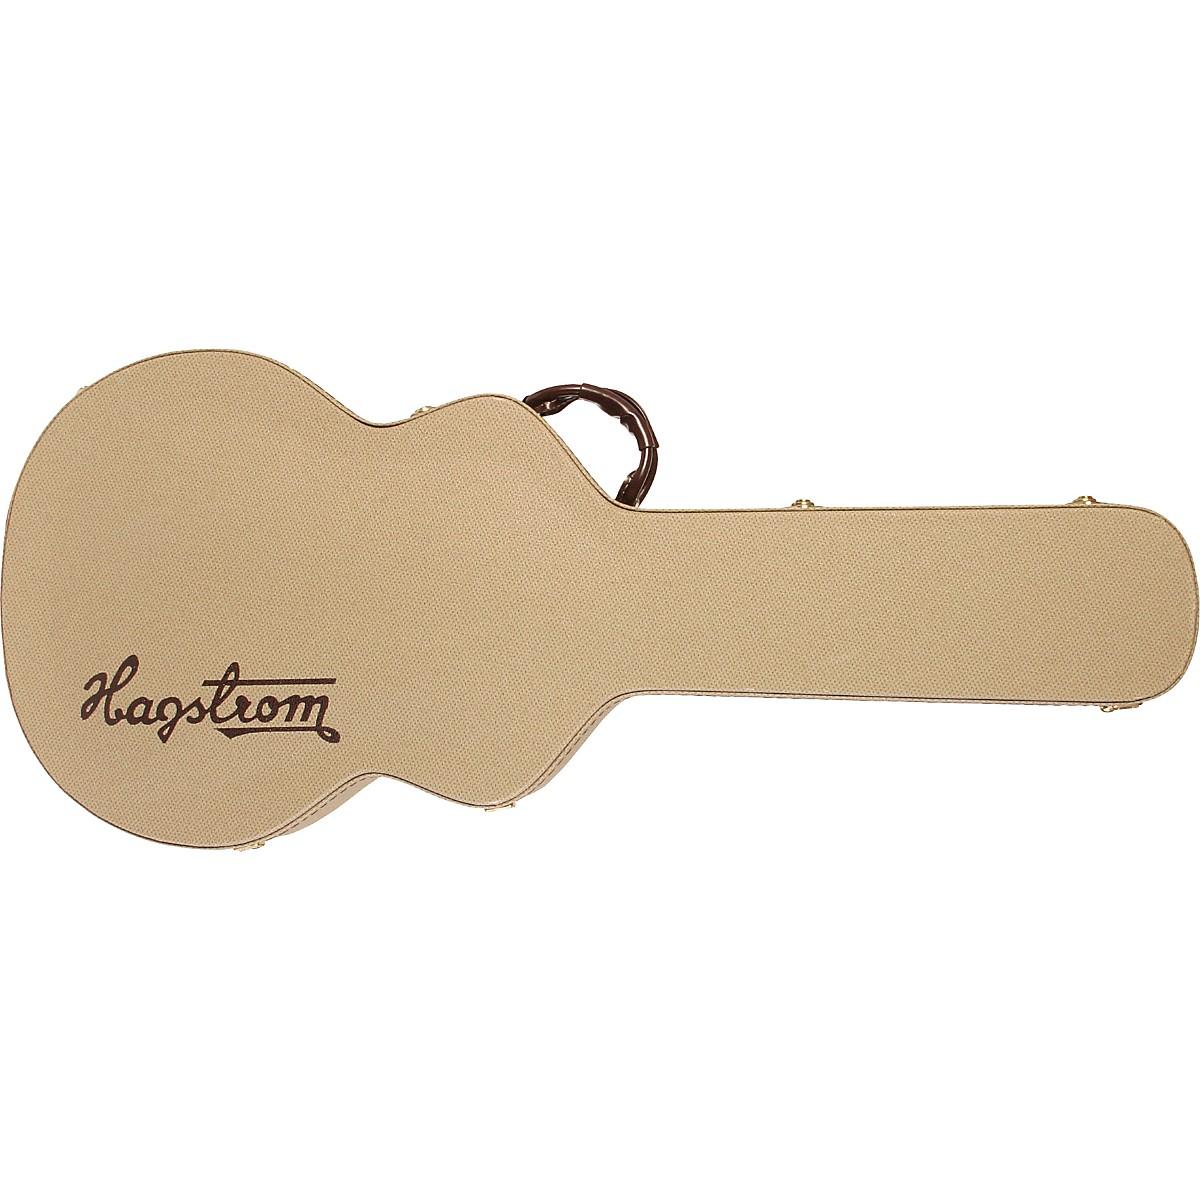 Hagstrom C55 Viking Guitar Case